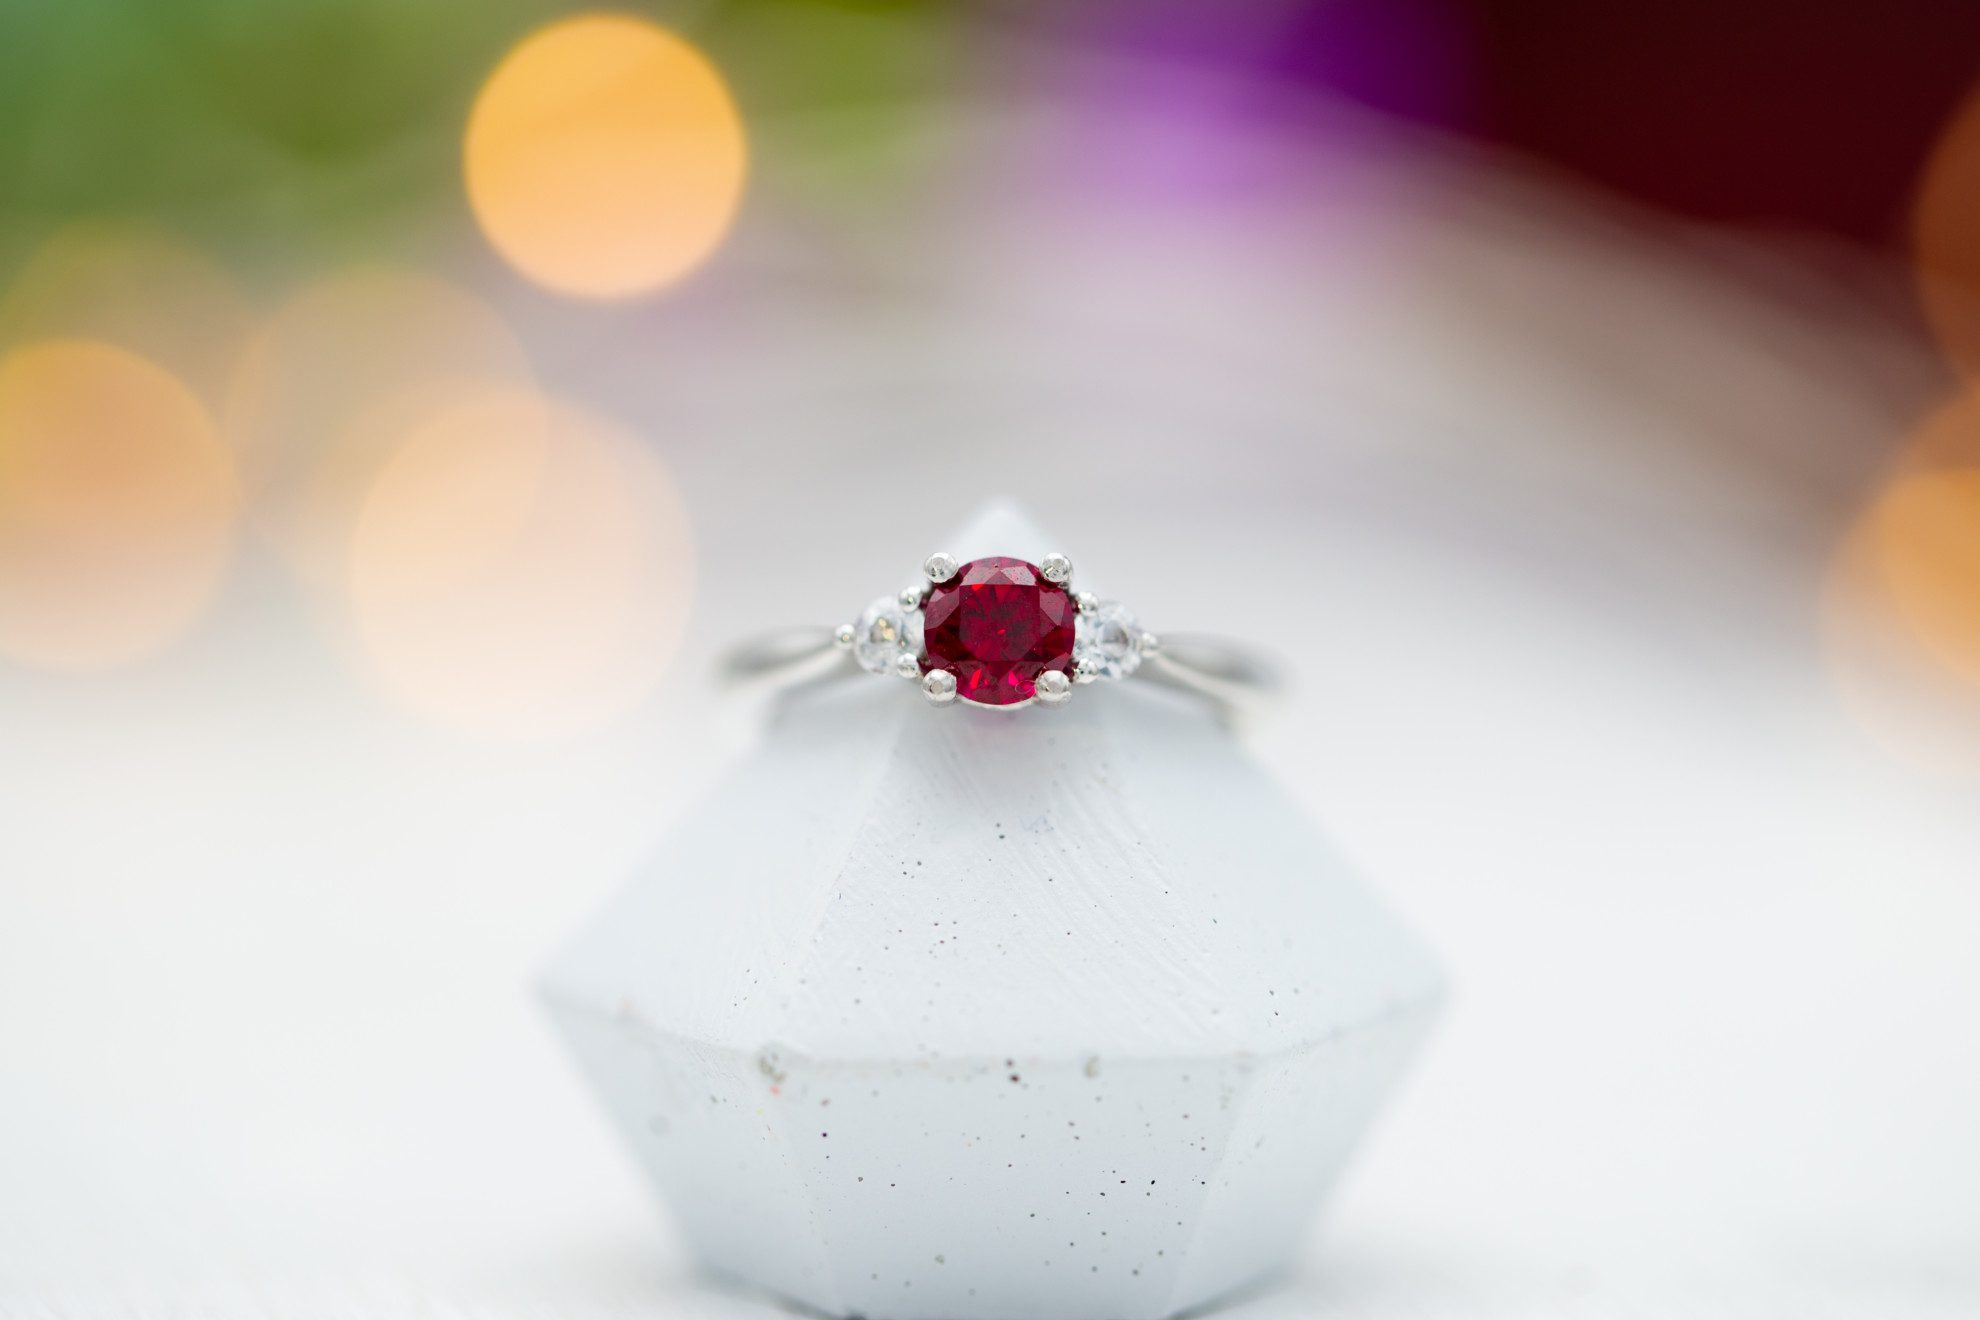 lab-made ruby